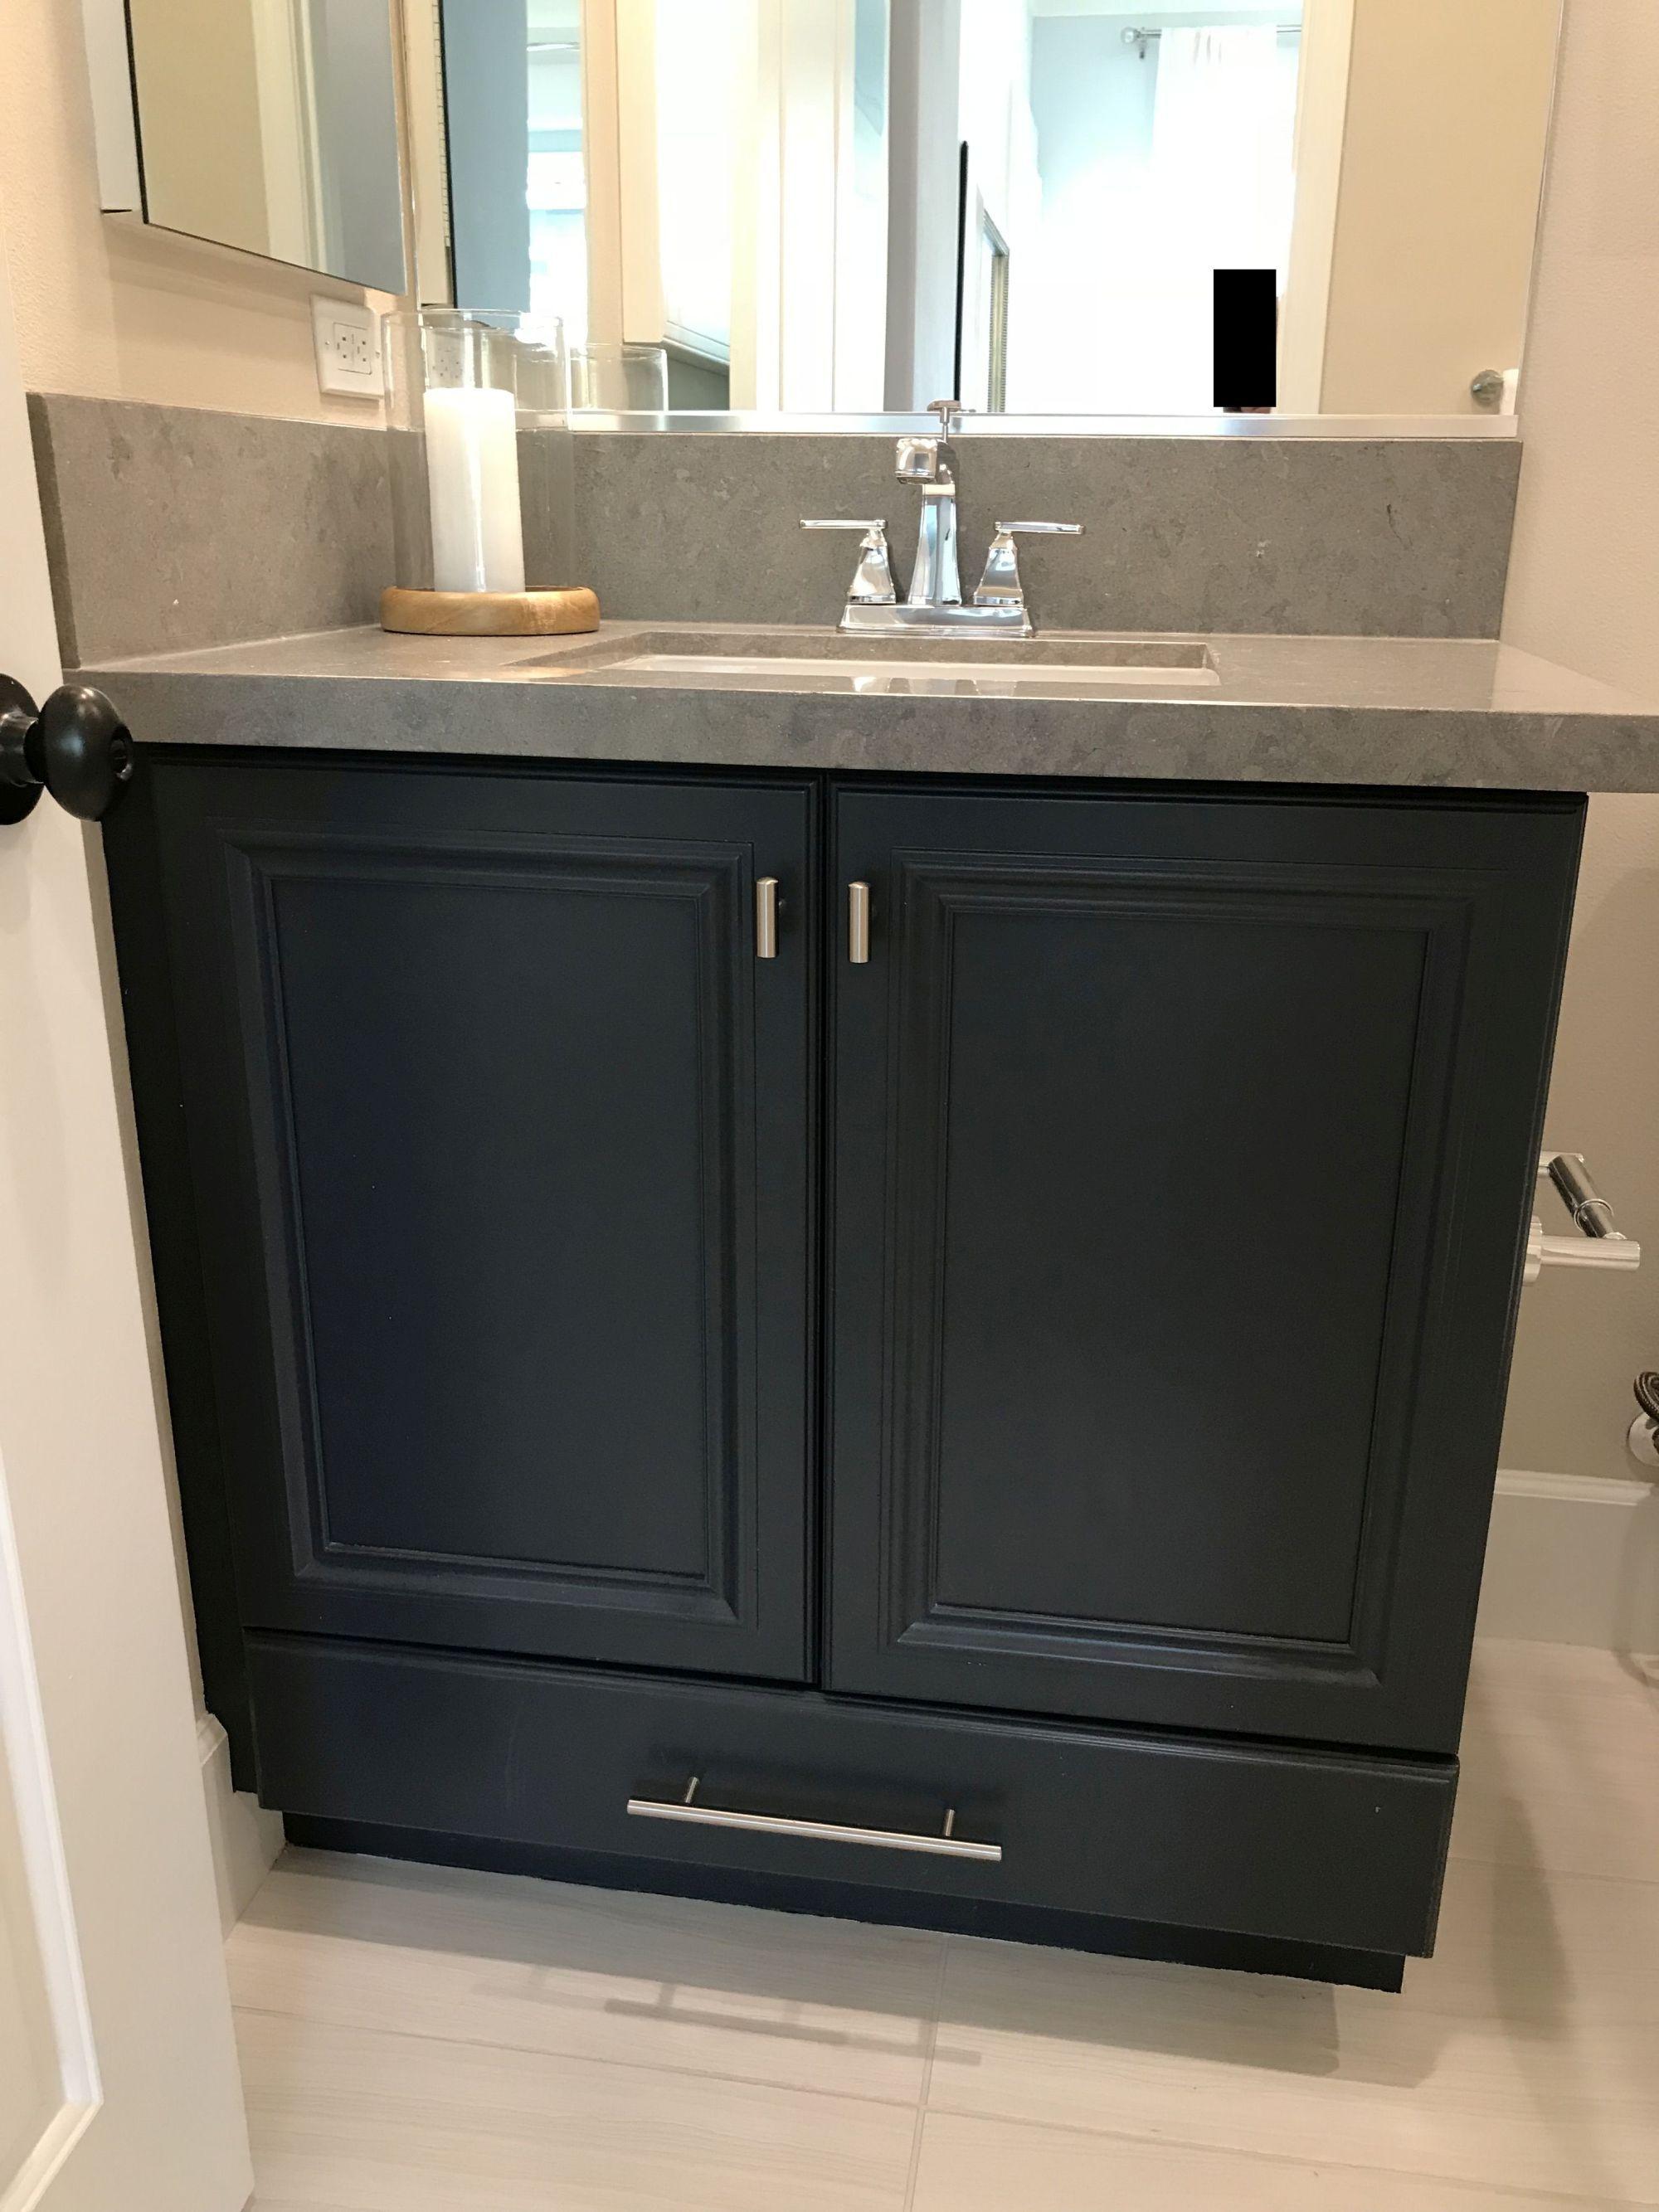 Bathroom Remodel Ideas Navy Blue Cabinet Gray Quartz Countertop